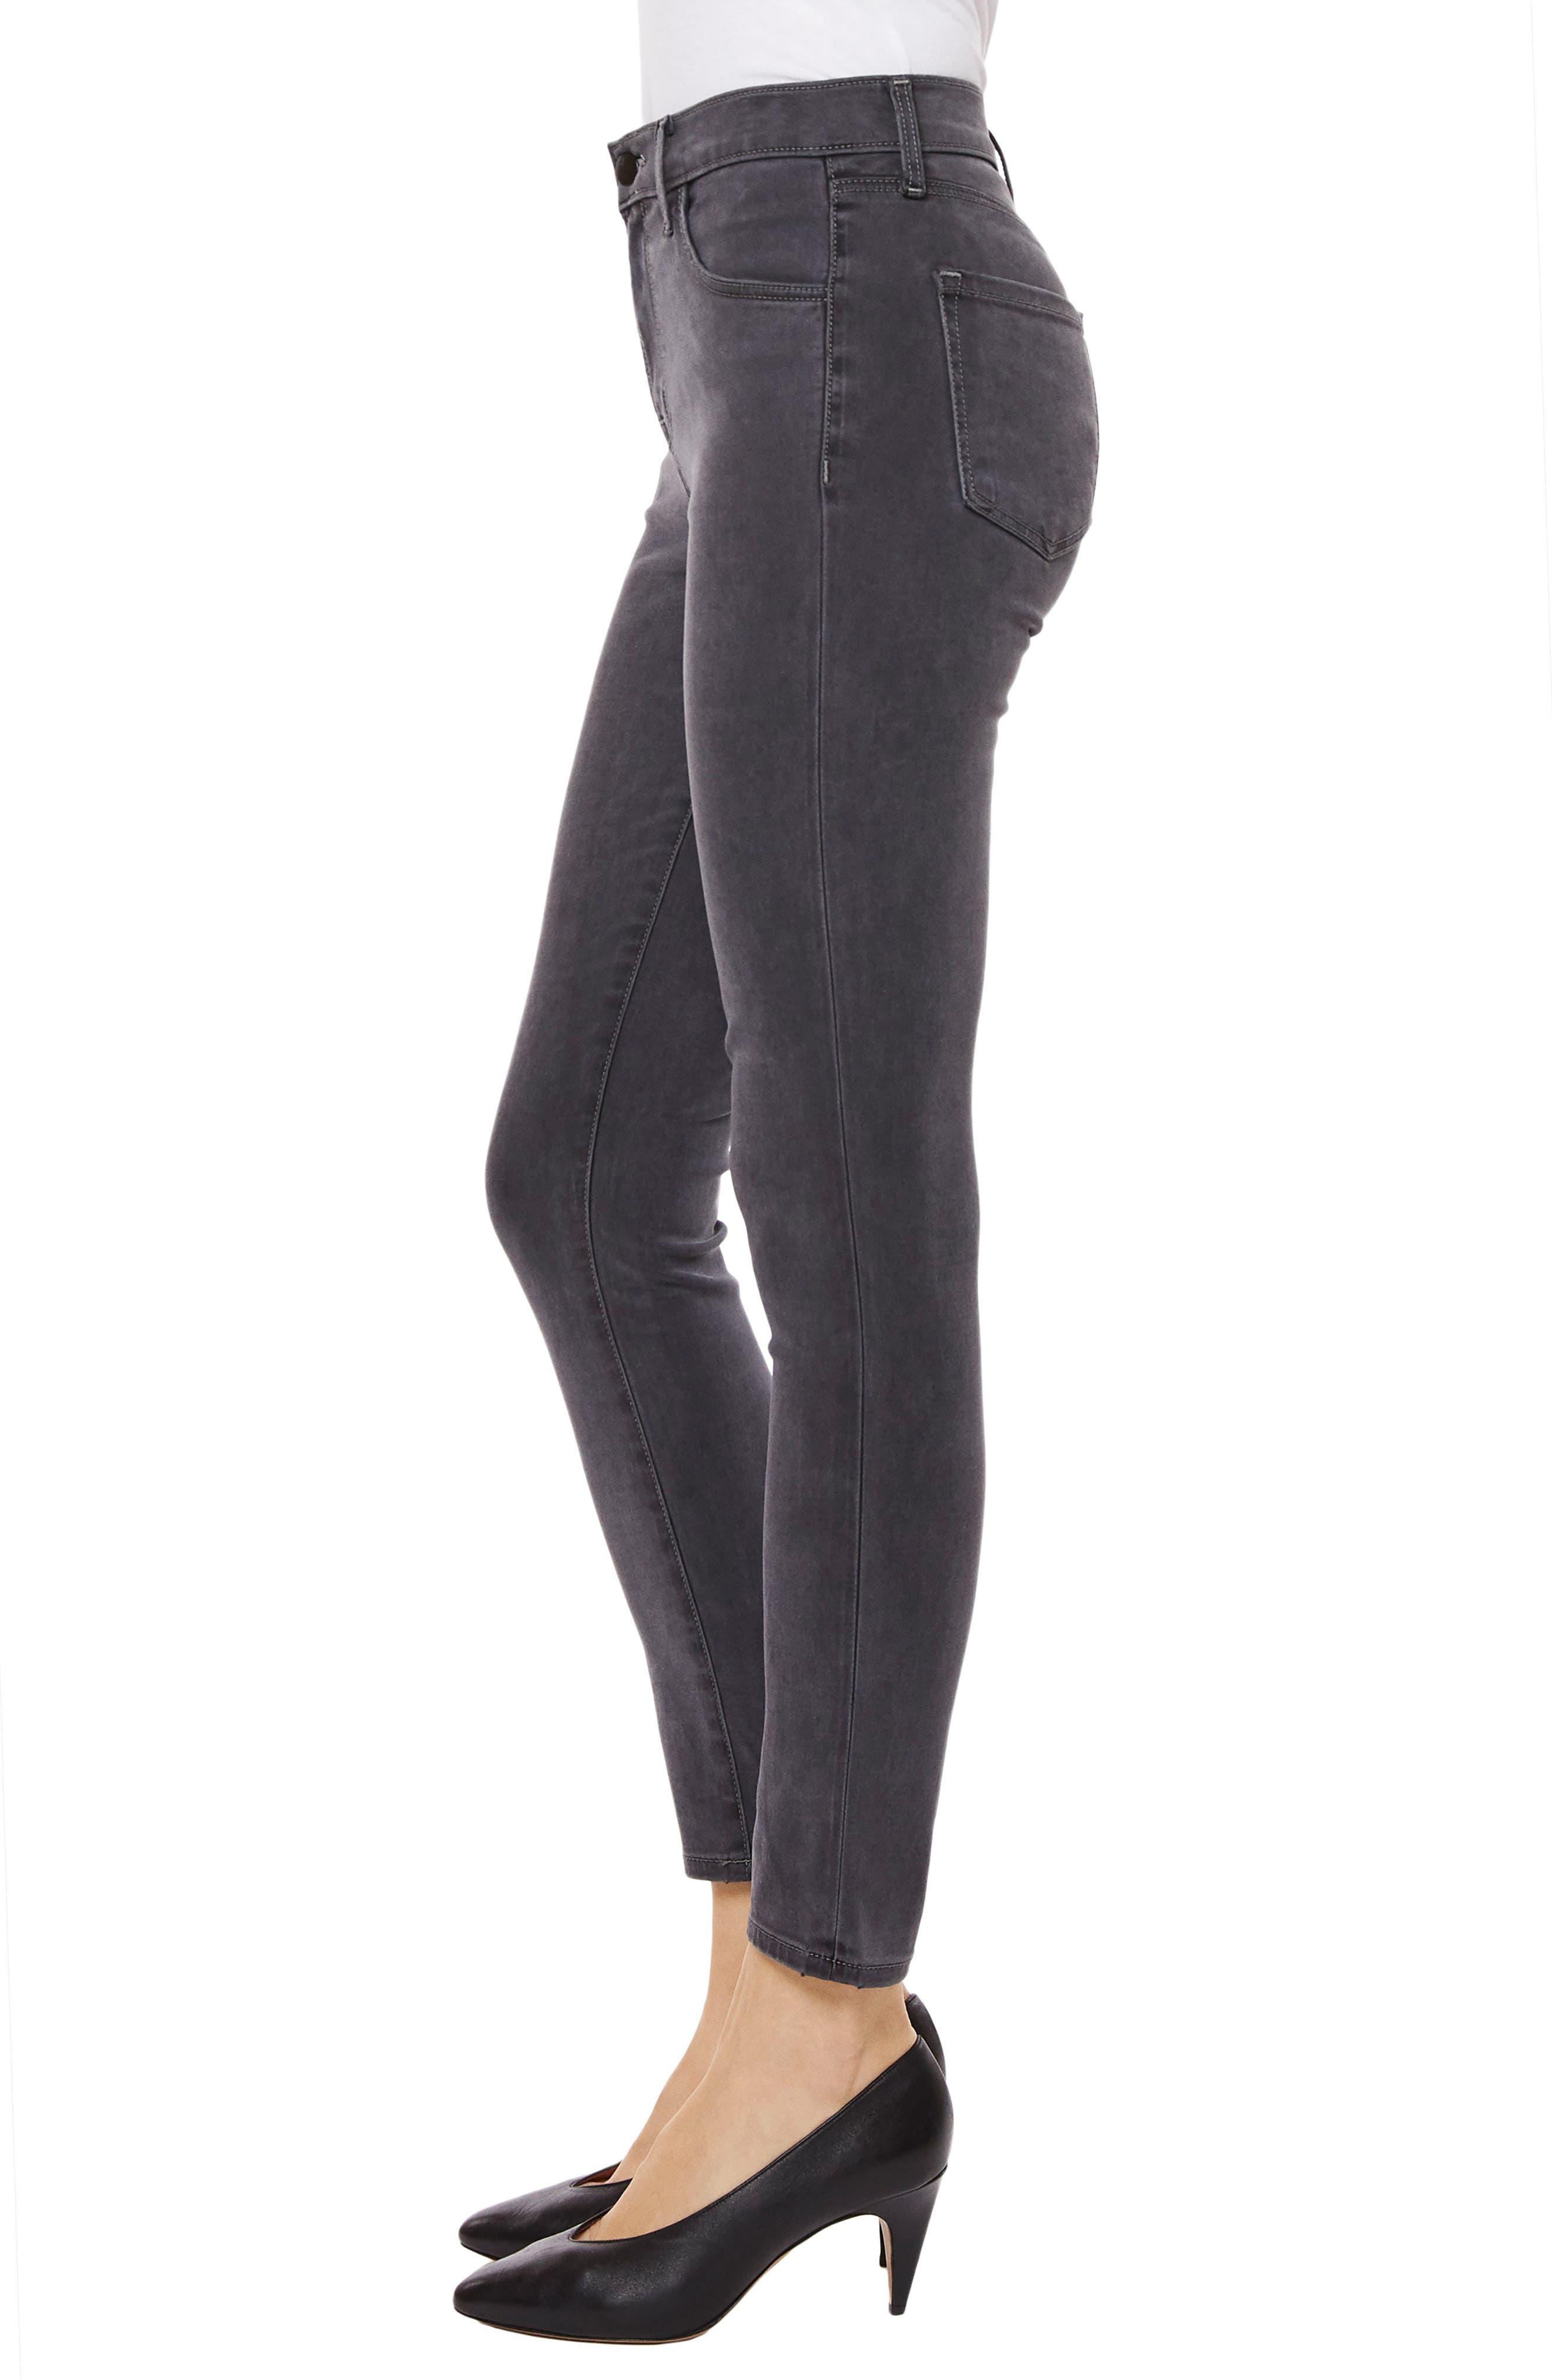 Alana High Waist Crop Skinny Jeans,                             Alternate thumbnail 3, color,                             010